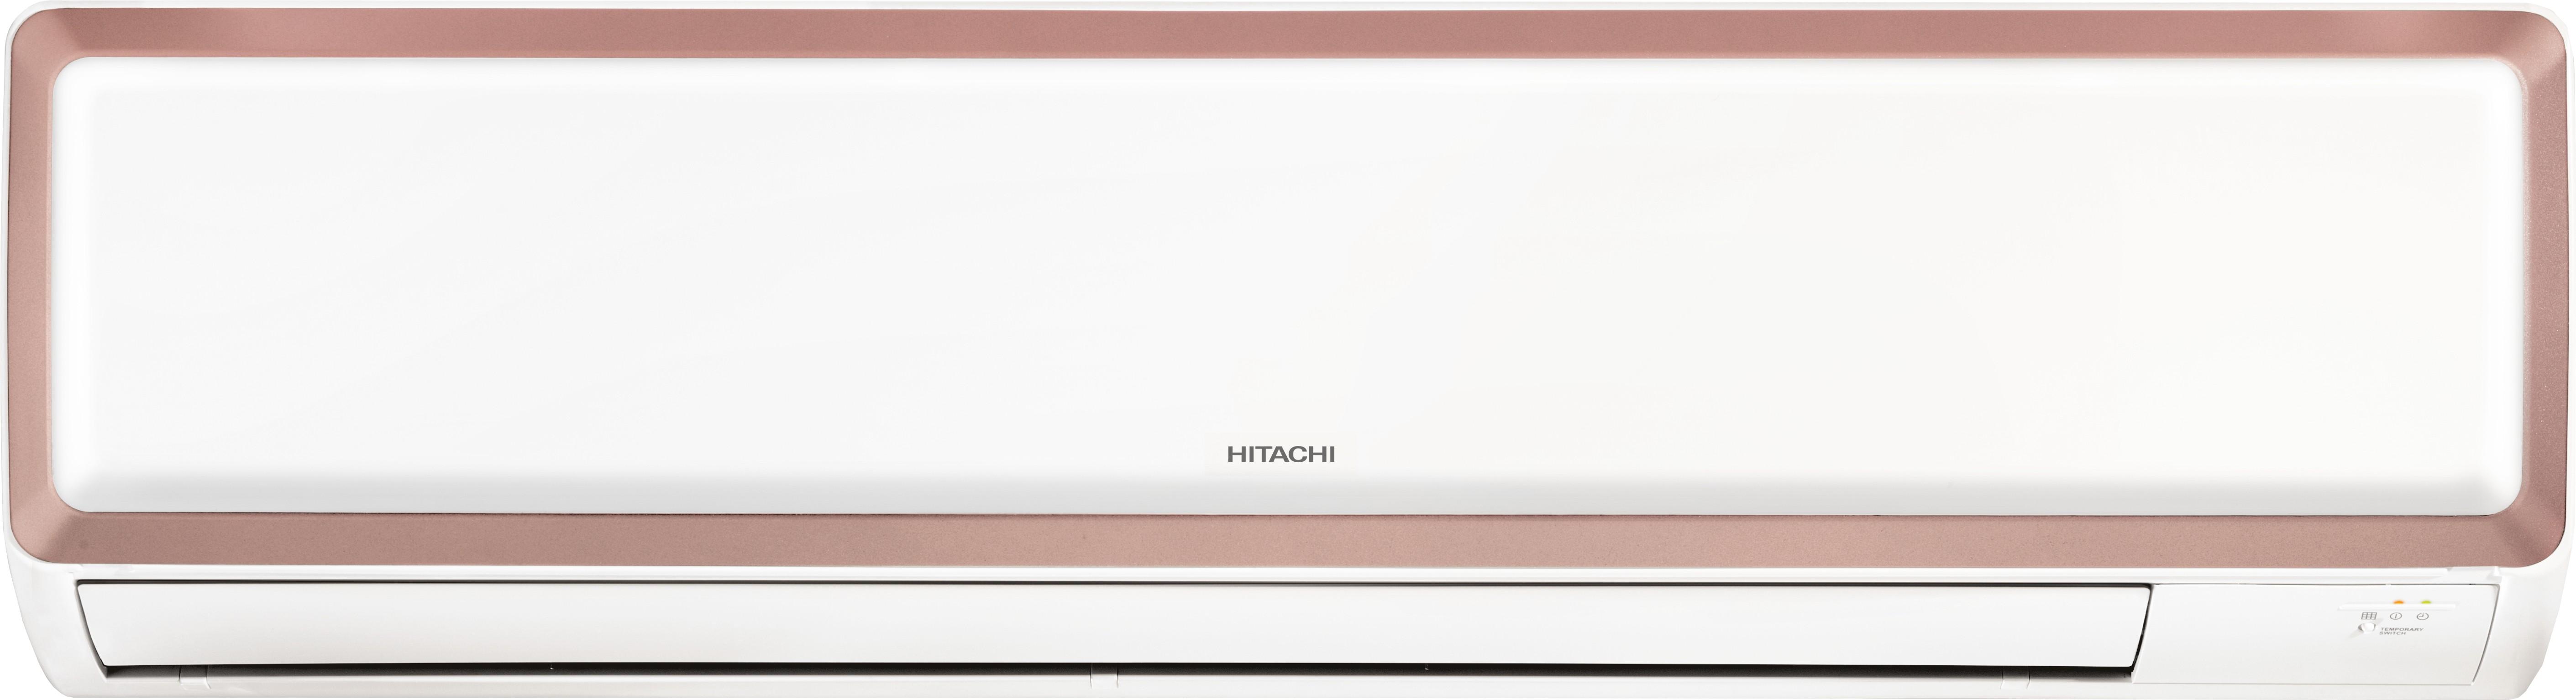 Hitachi 1.5 Tons Inverter Split AC Copper (Hitachi)  Buy Online